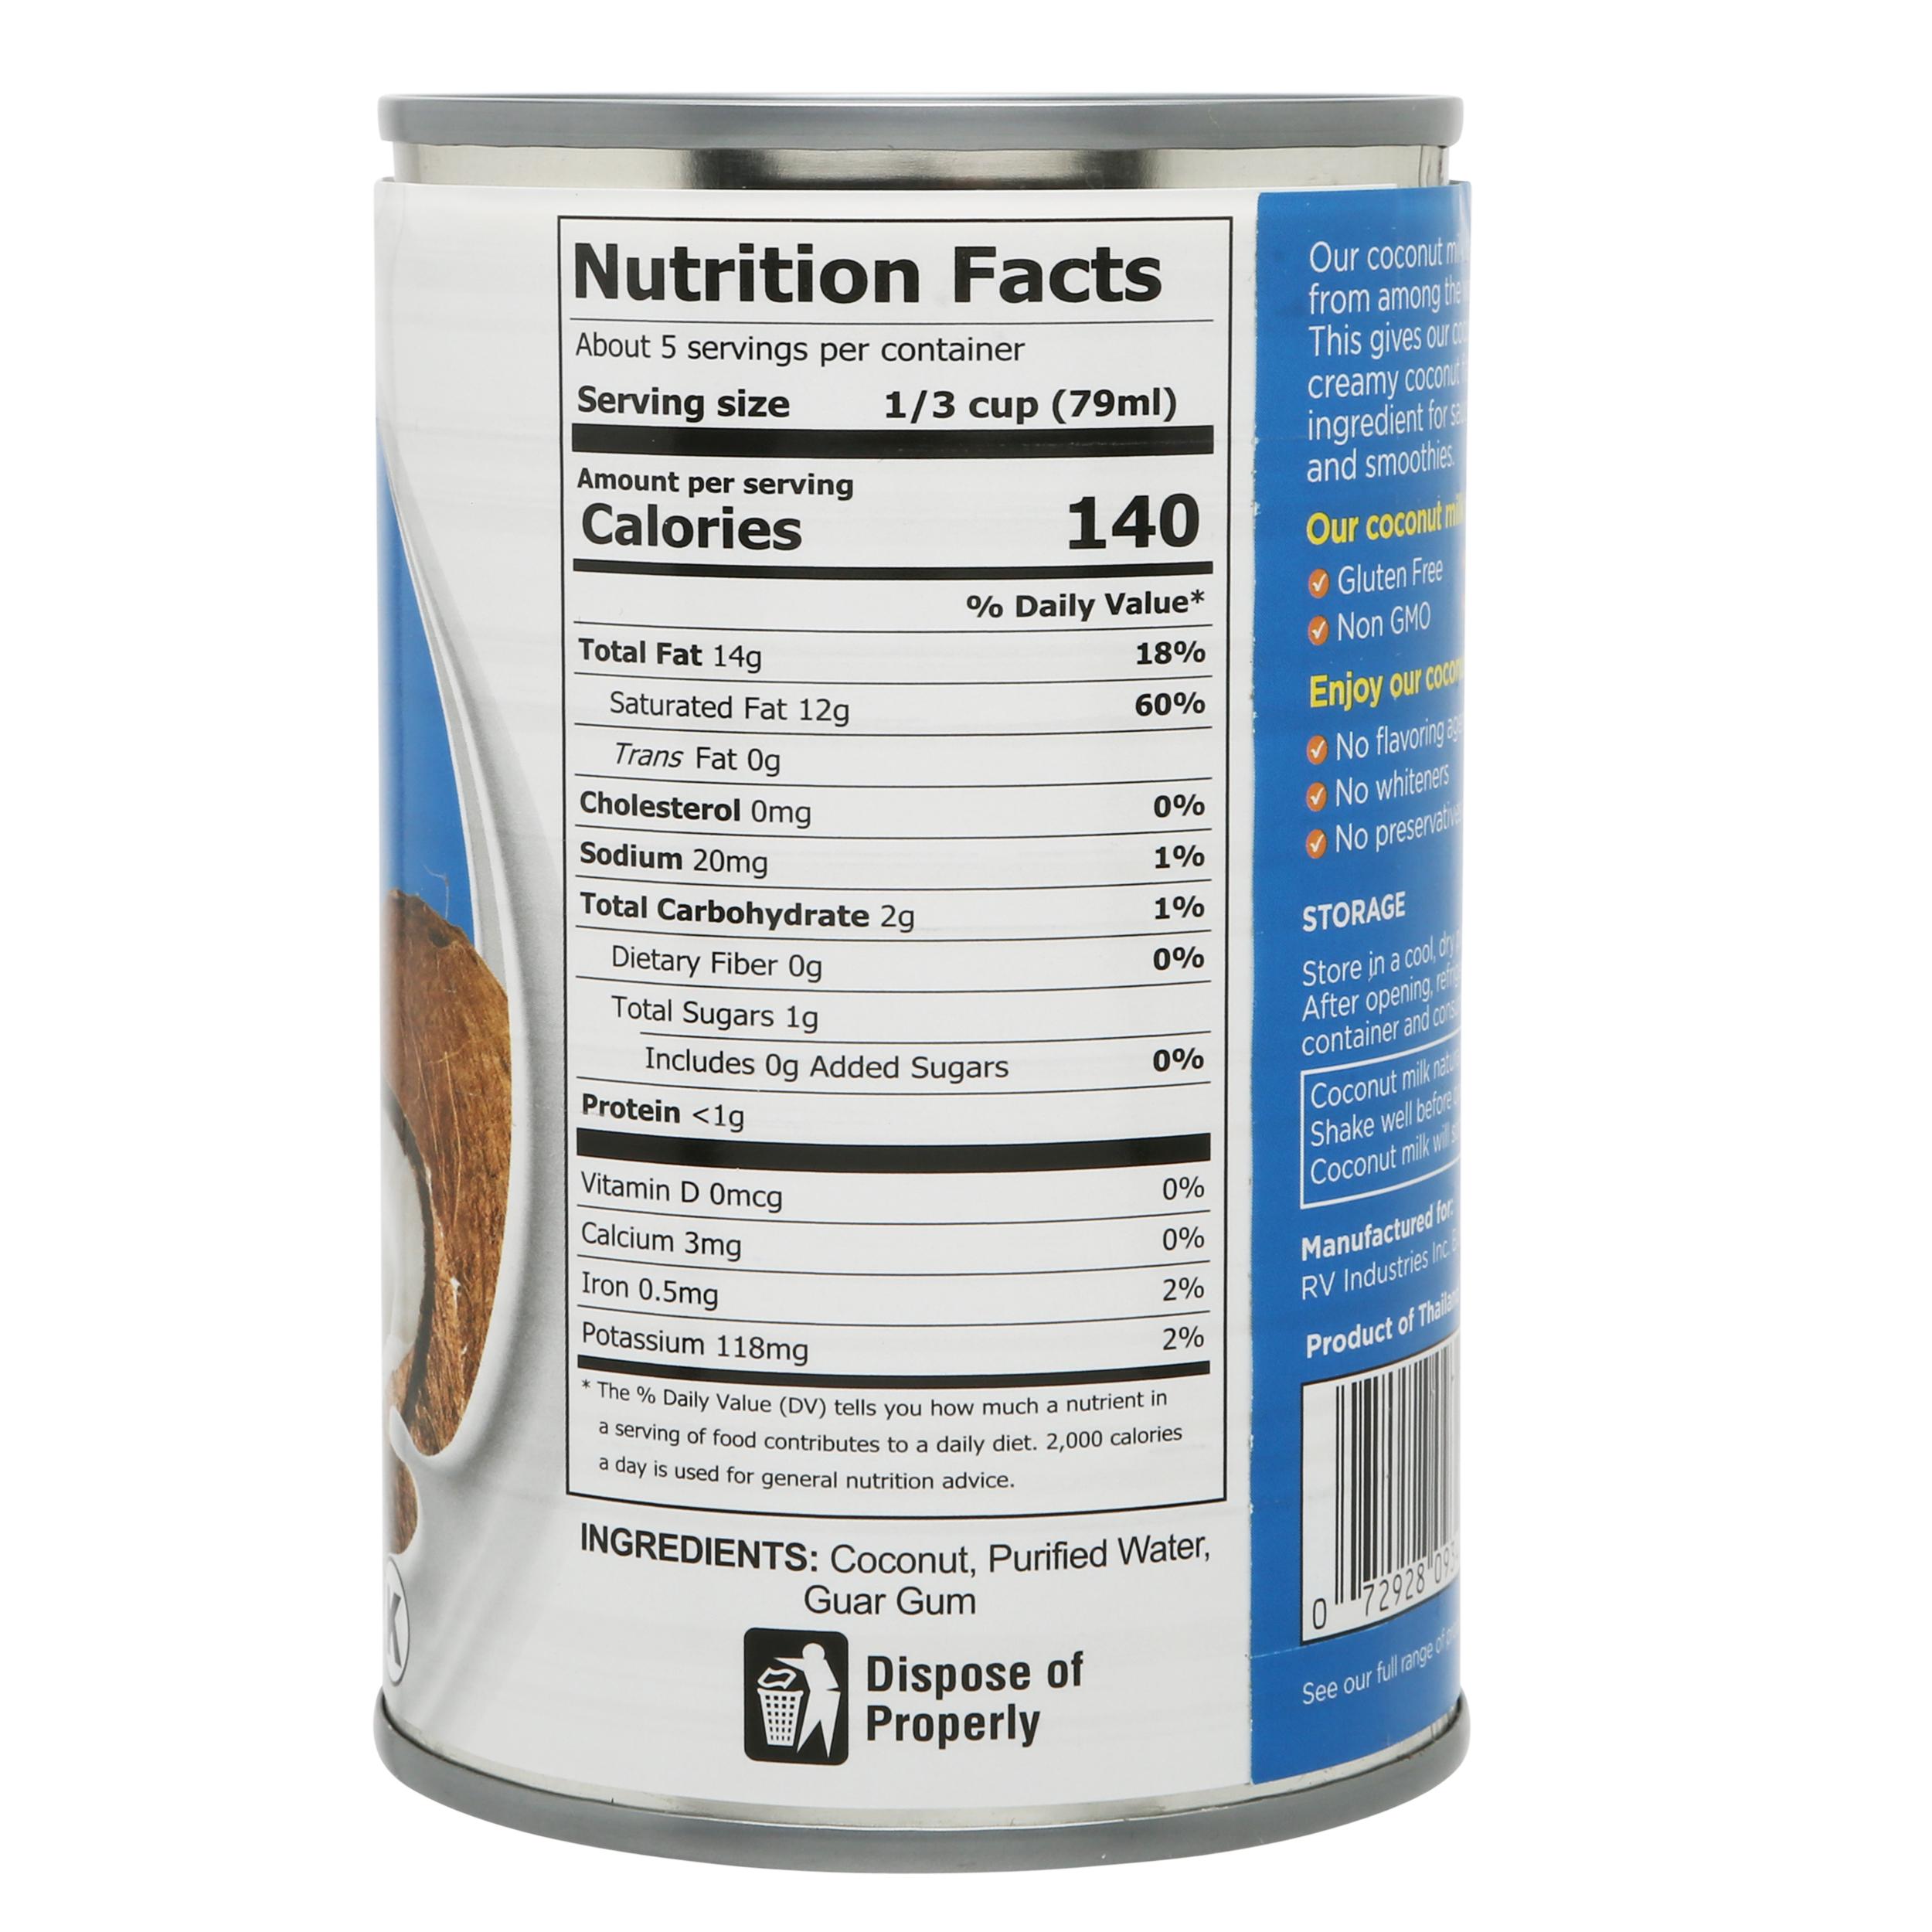 Fiesta Tropicale Natural Coconut Milk_Nutritional Info